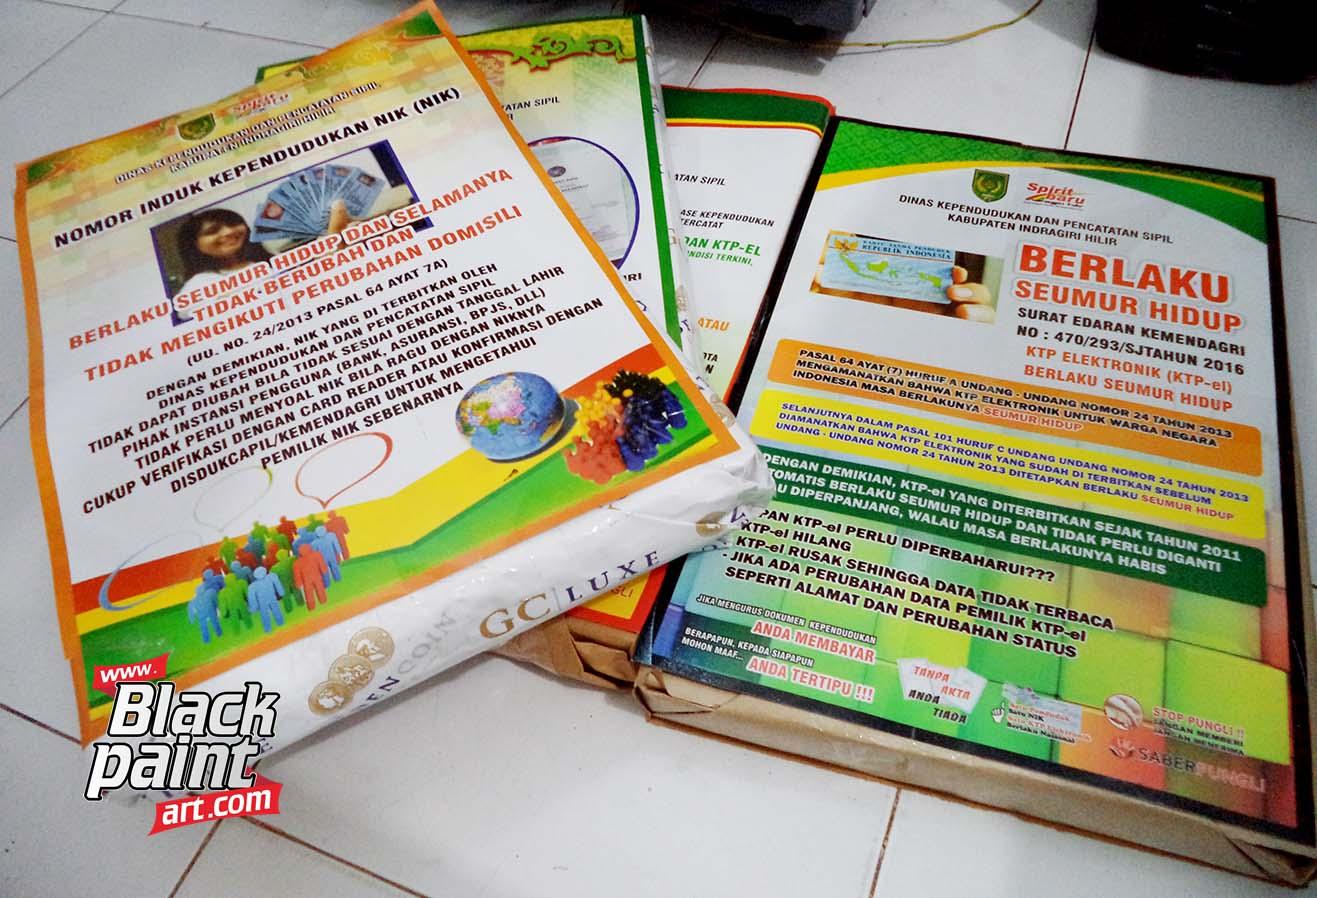 481 cetak poster pekanbaru.jpg